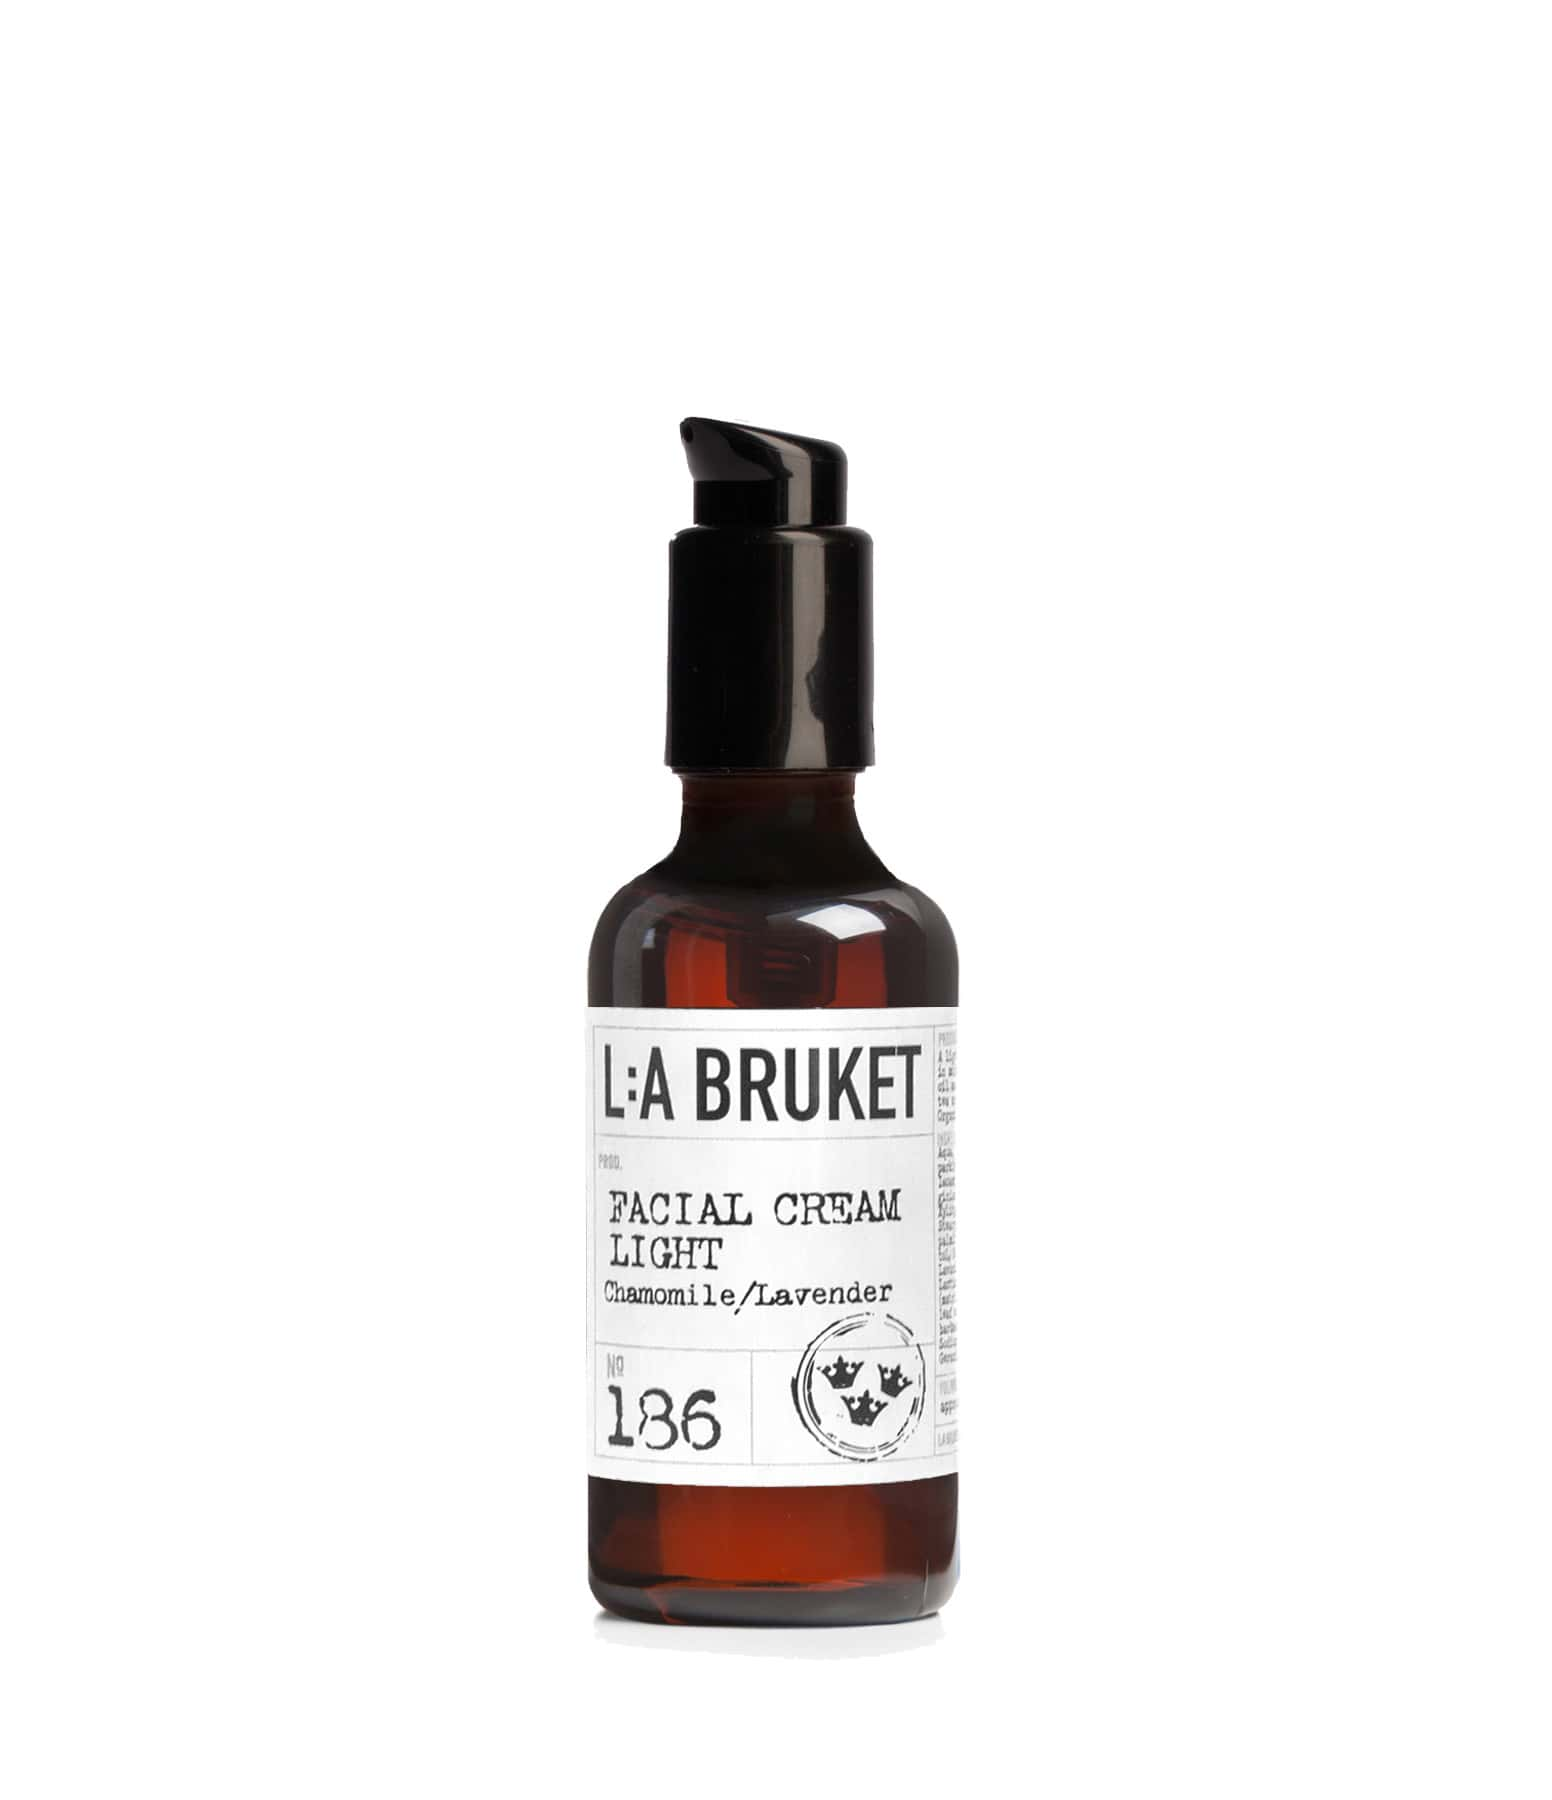 L:A BRUKET - Crème Visage Camomille Lavande 50ml N°186